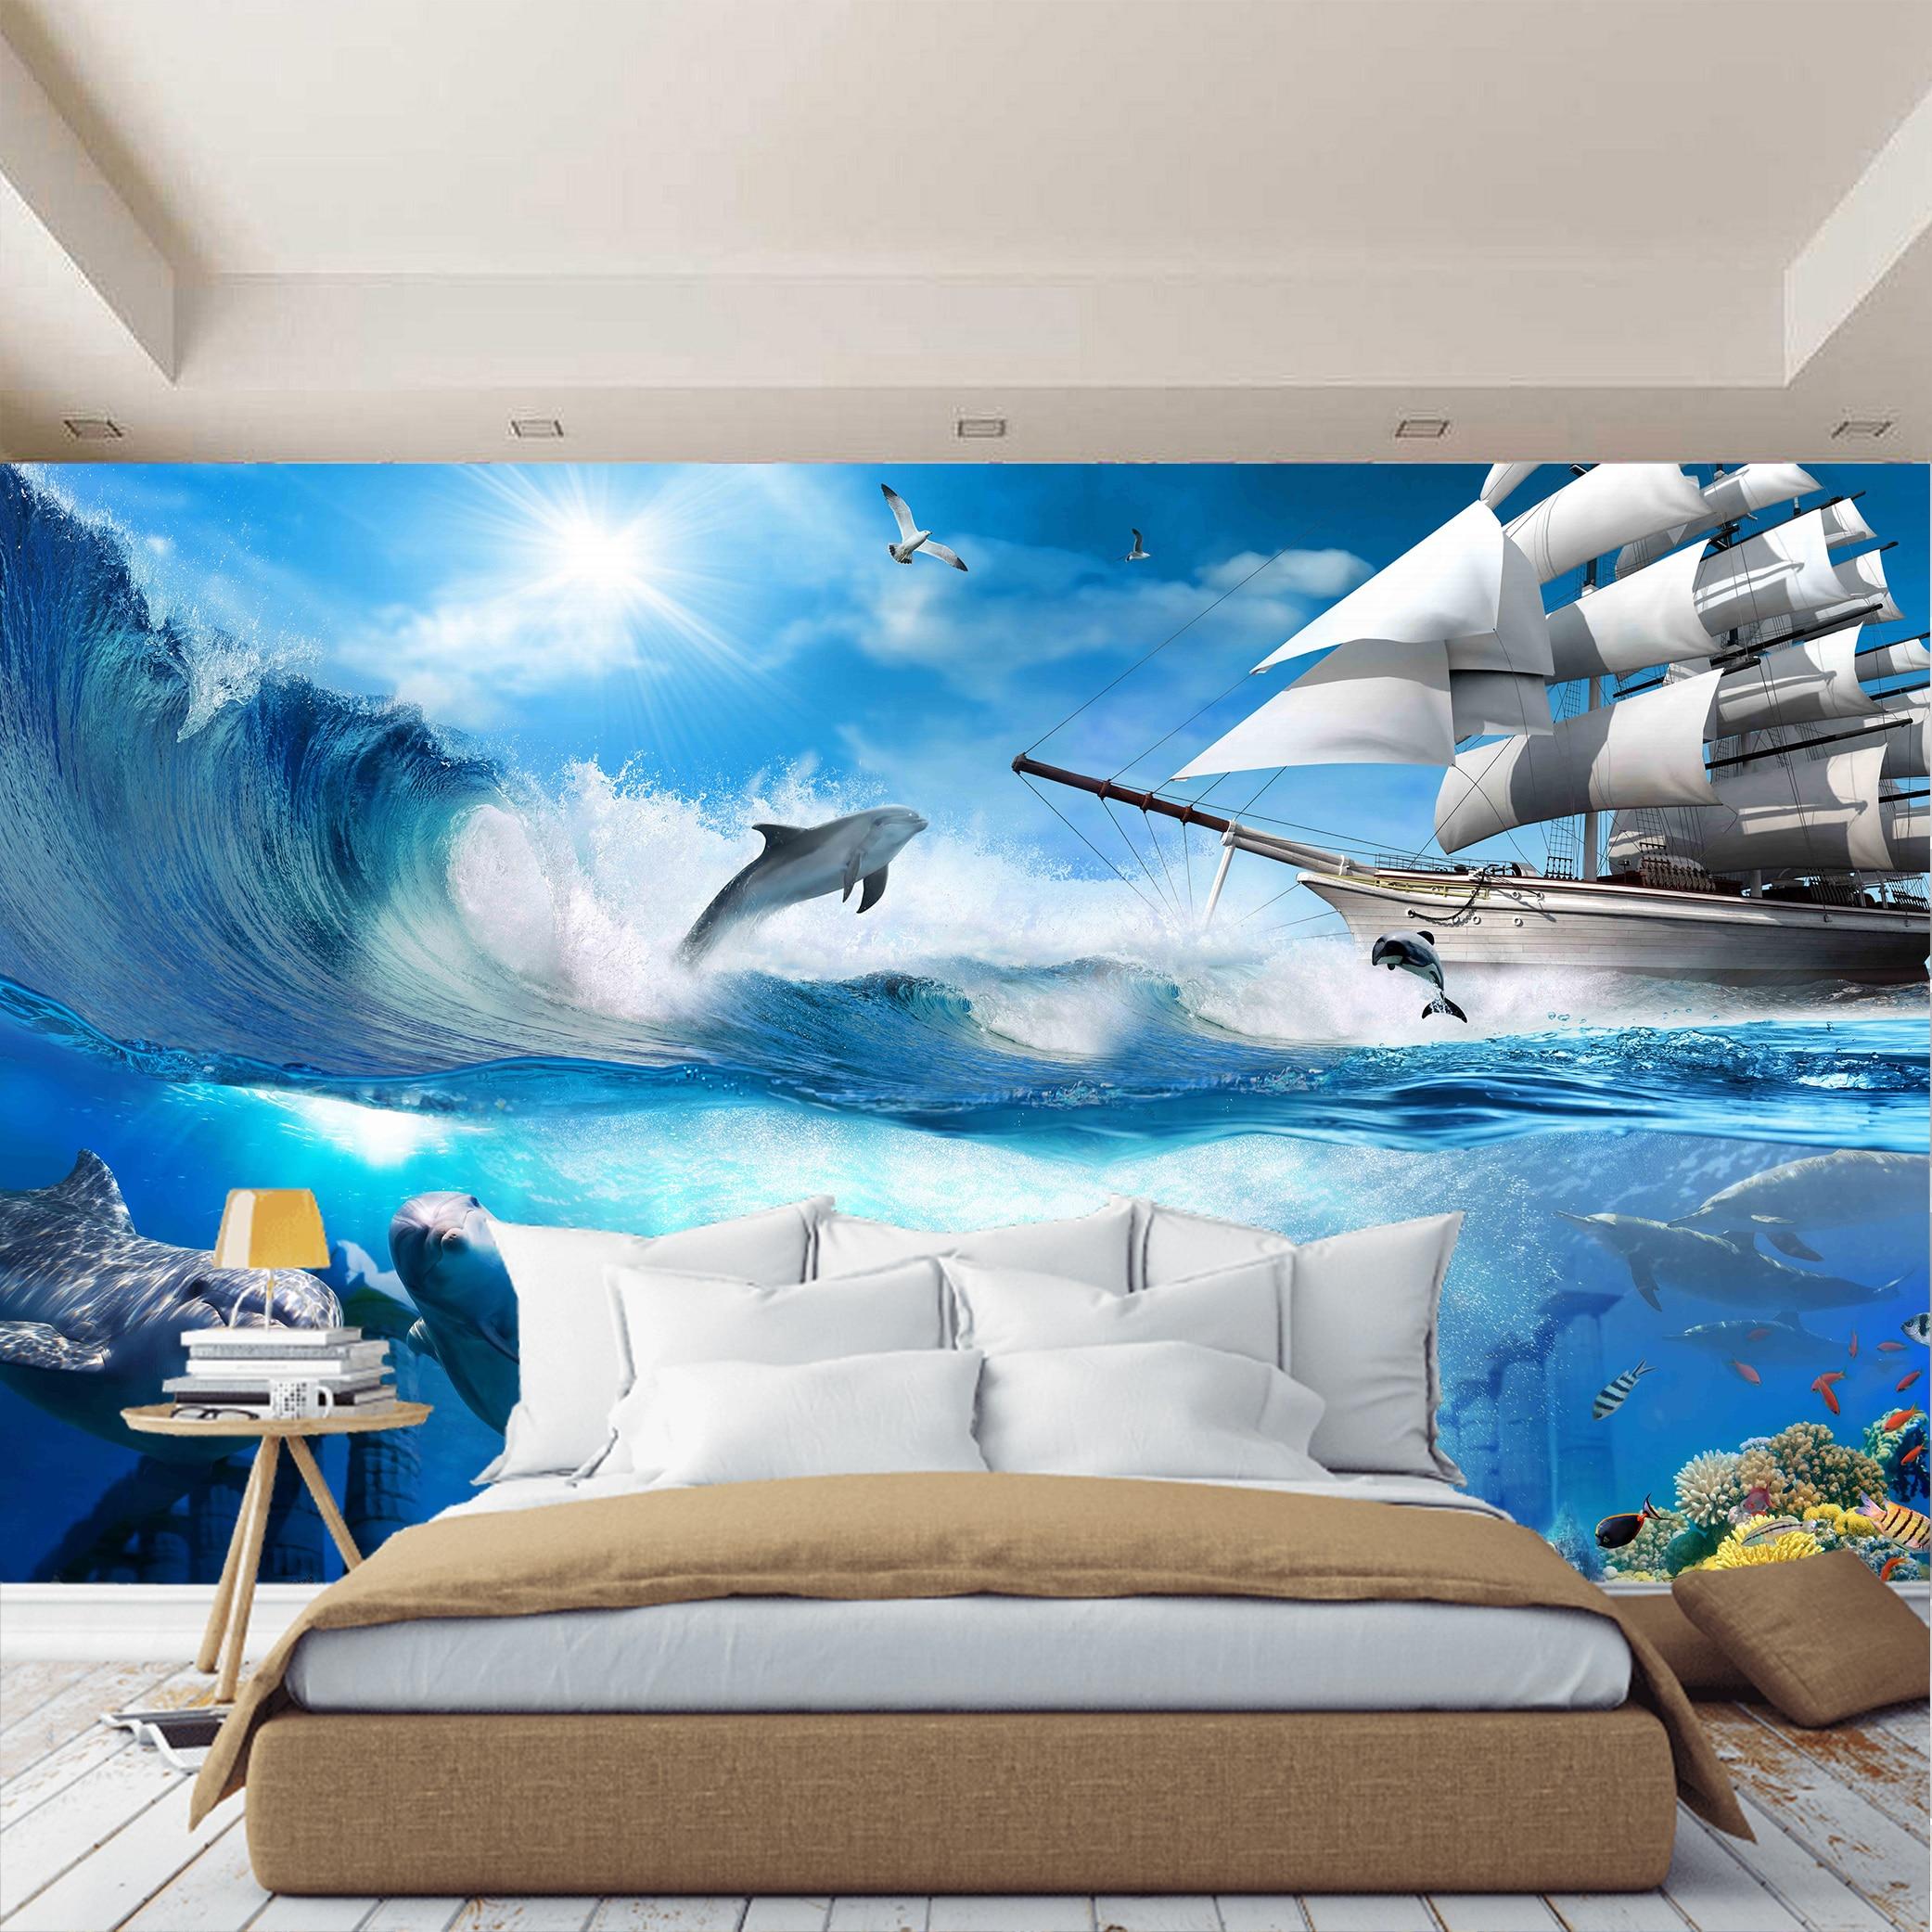 3D Wall Mural Water World Ocean Sea Fish Wallpaper For Hall Kitchen Bedroom Kids Wall Mural